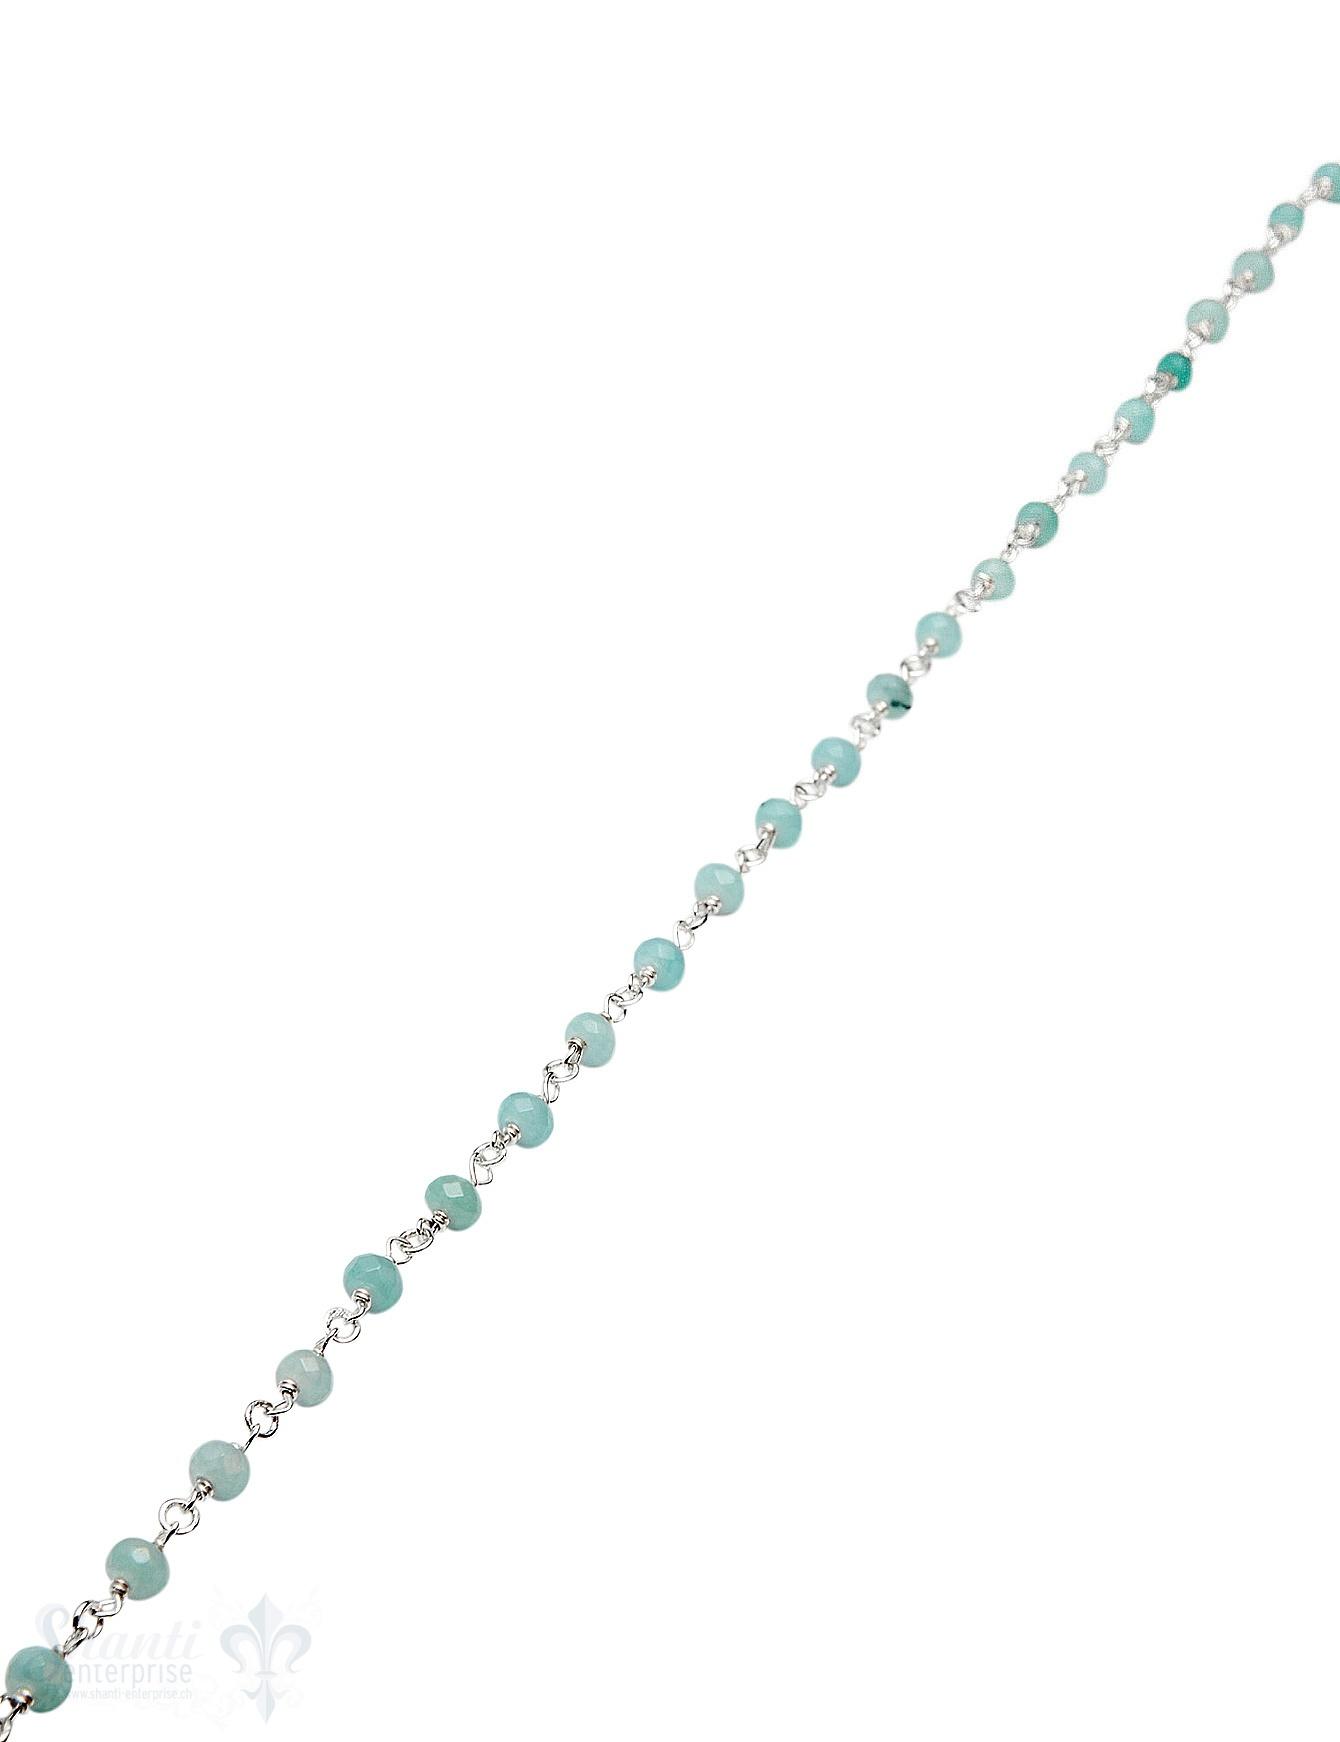 Rosenkranzkette Amazonit blau 4,5 mm Button facett